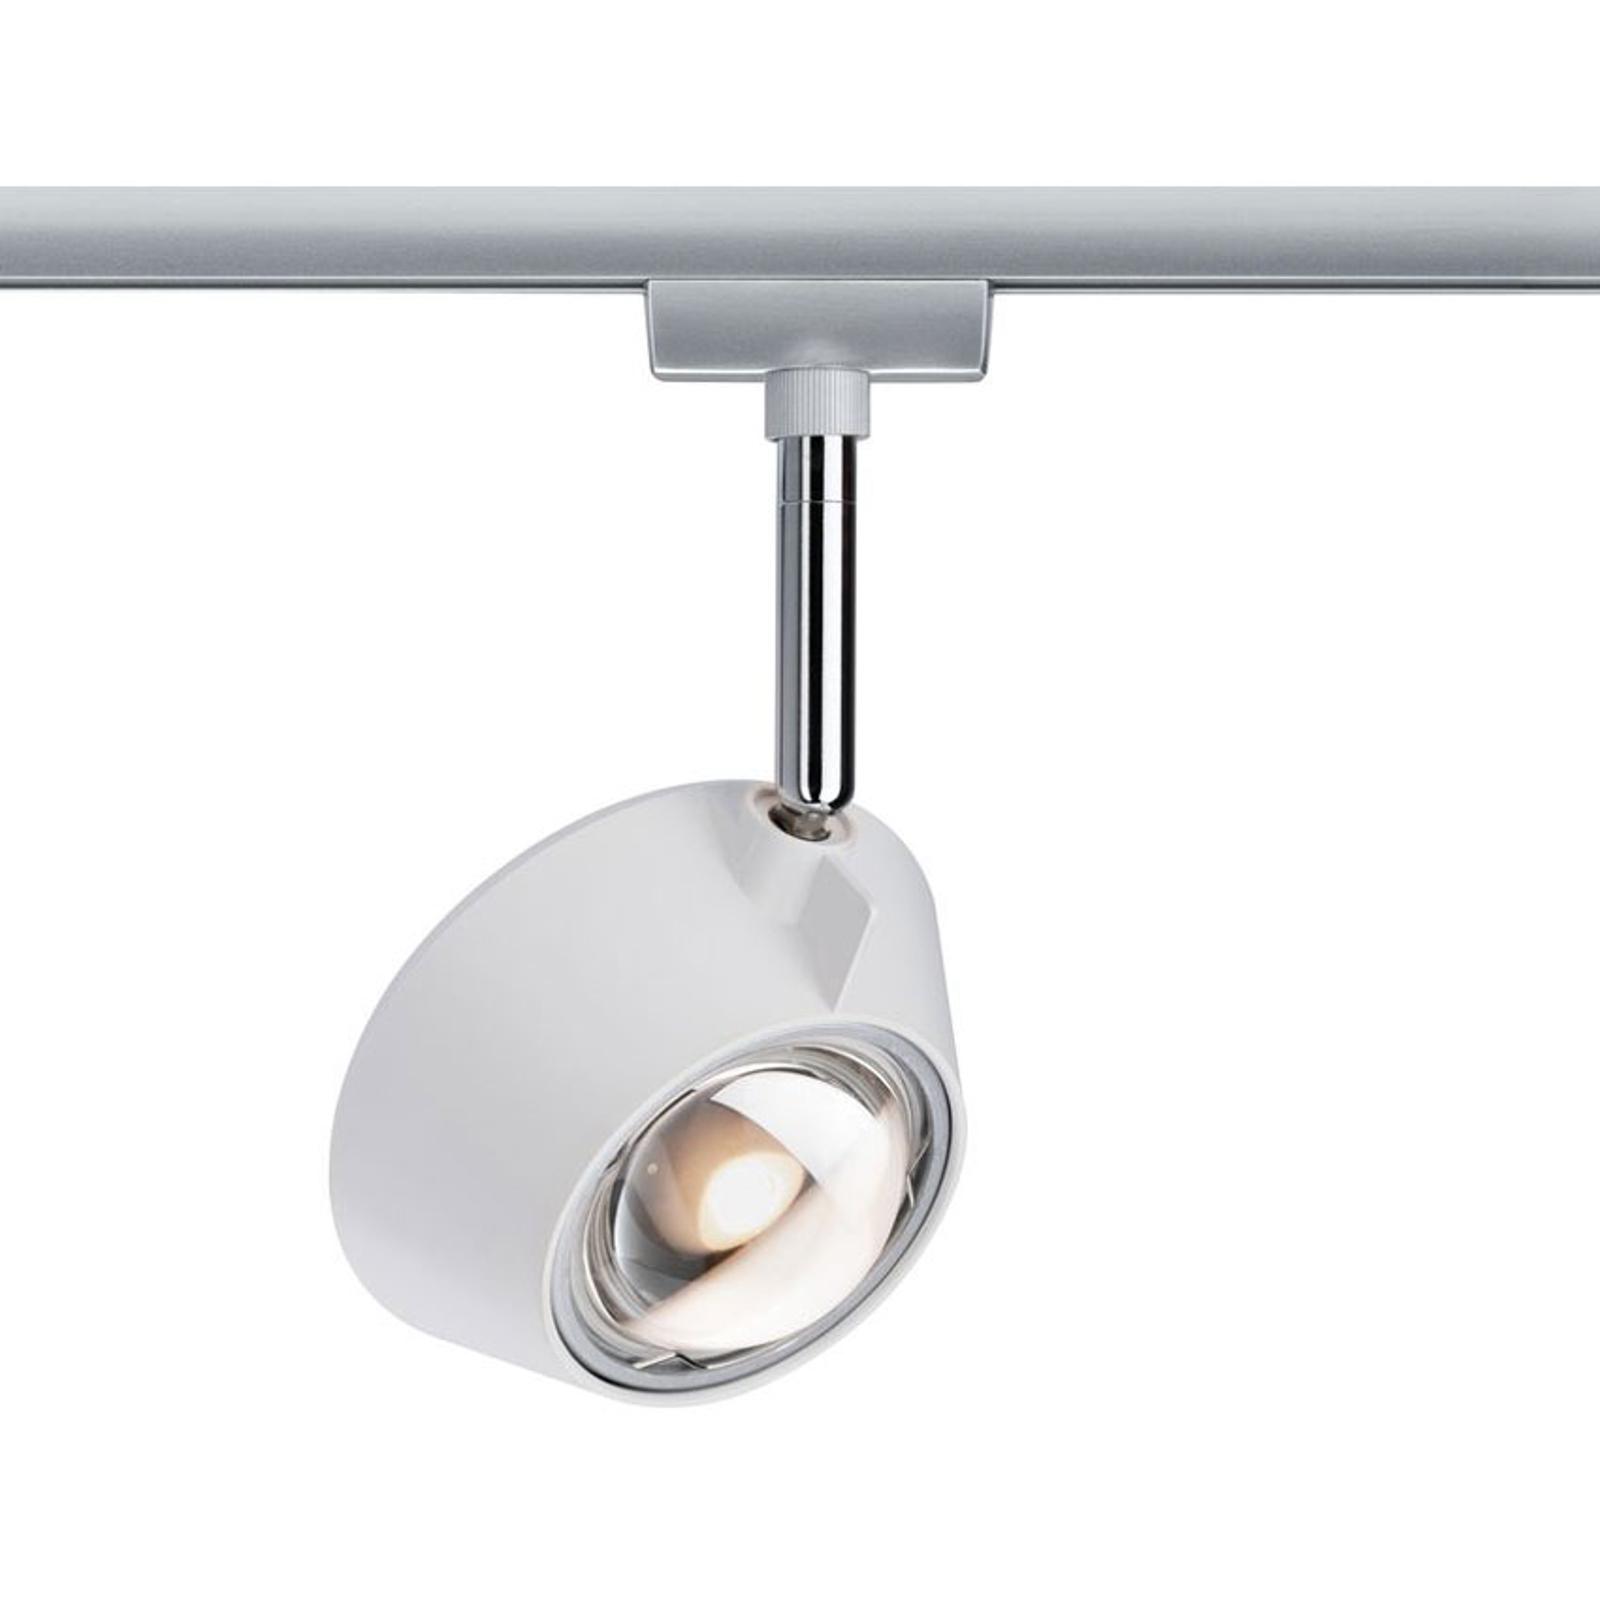 Paulmann URail LED spot Sabik chroom mat, dimbaar